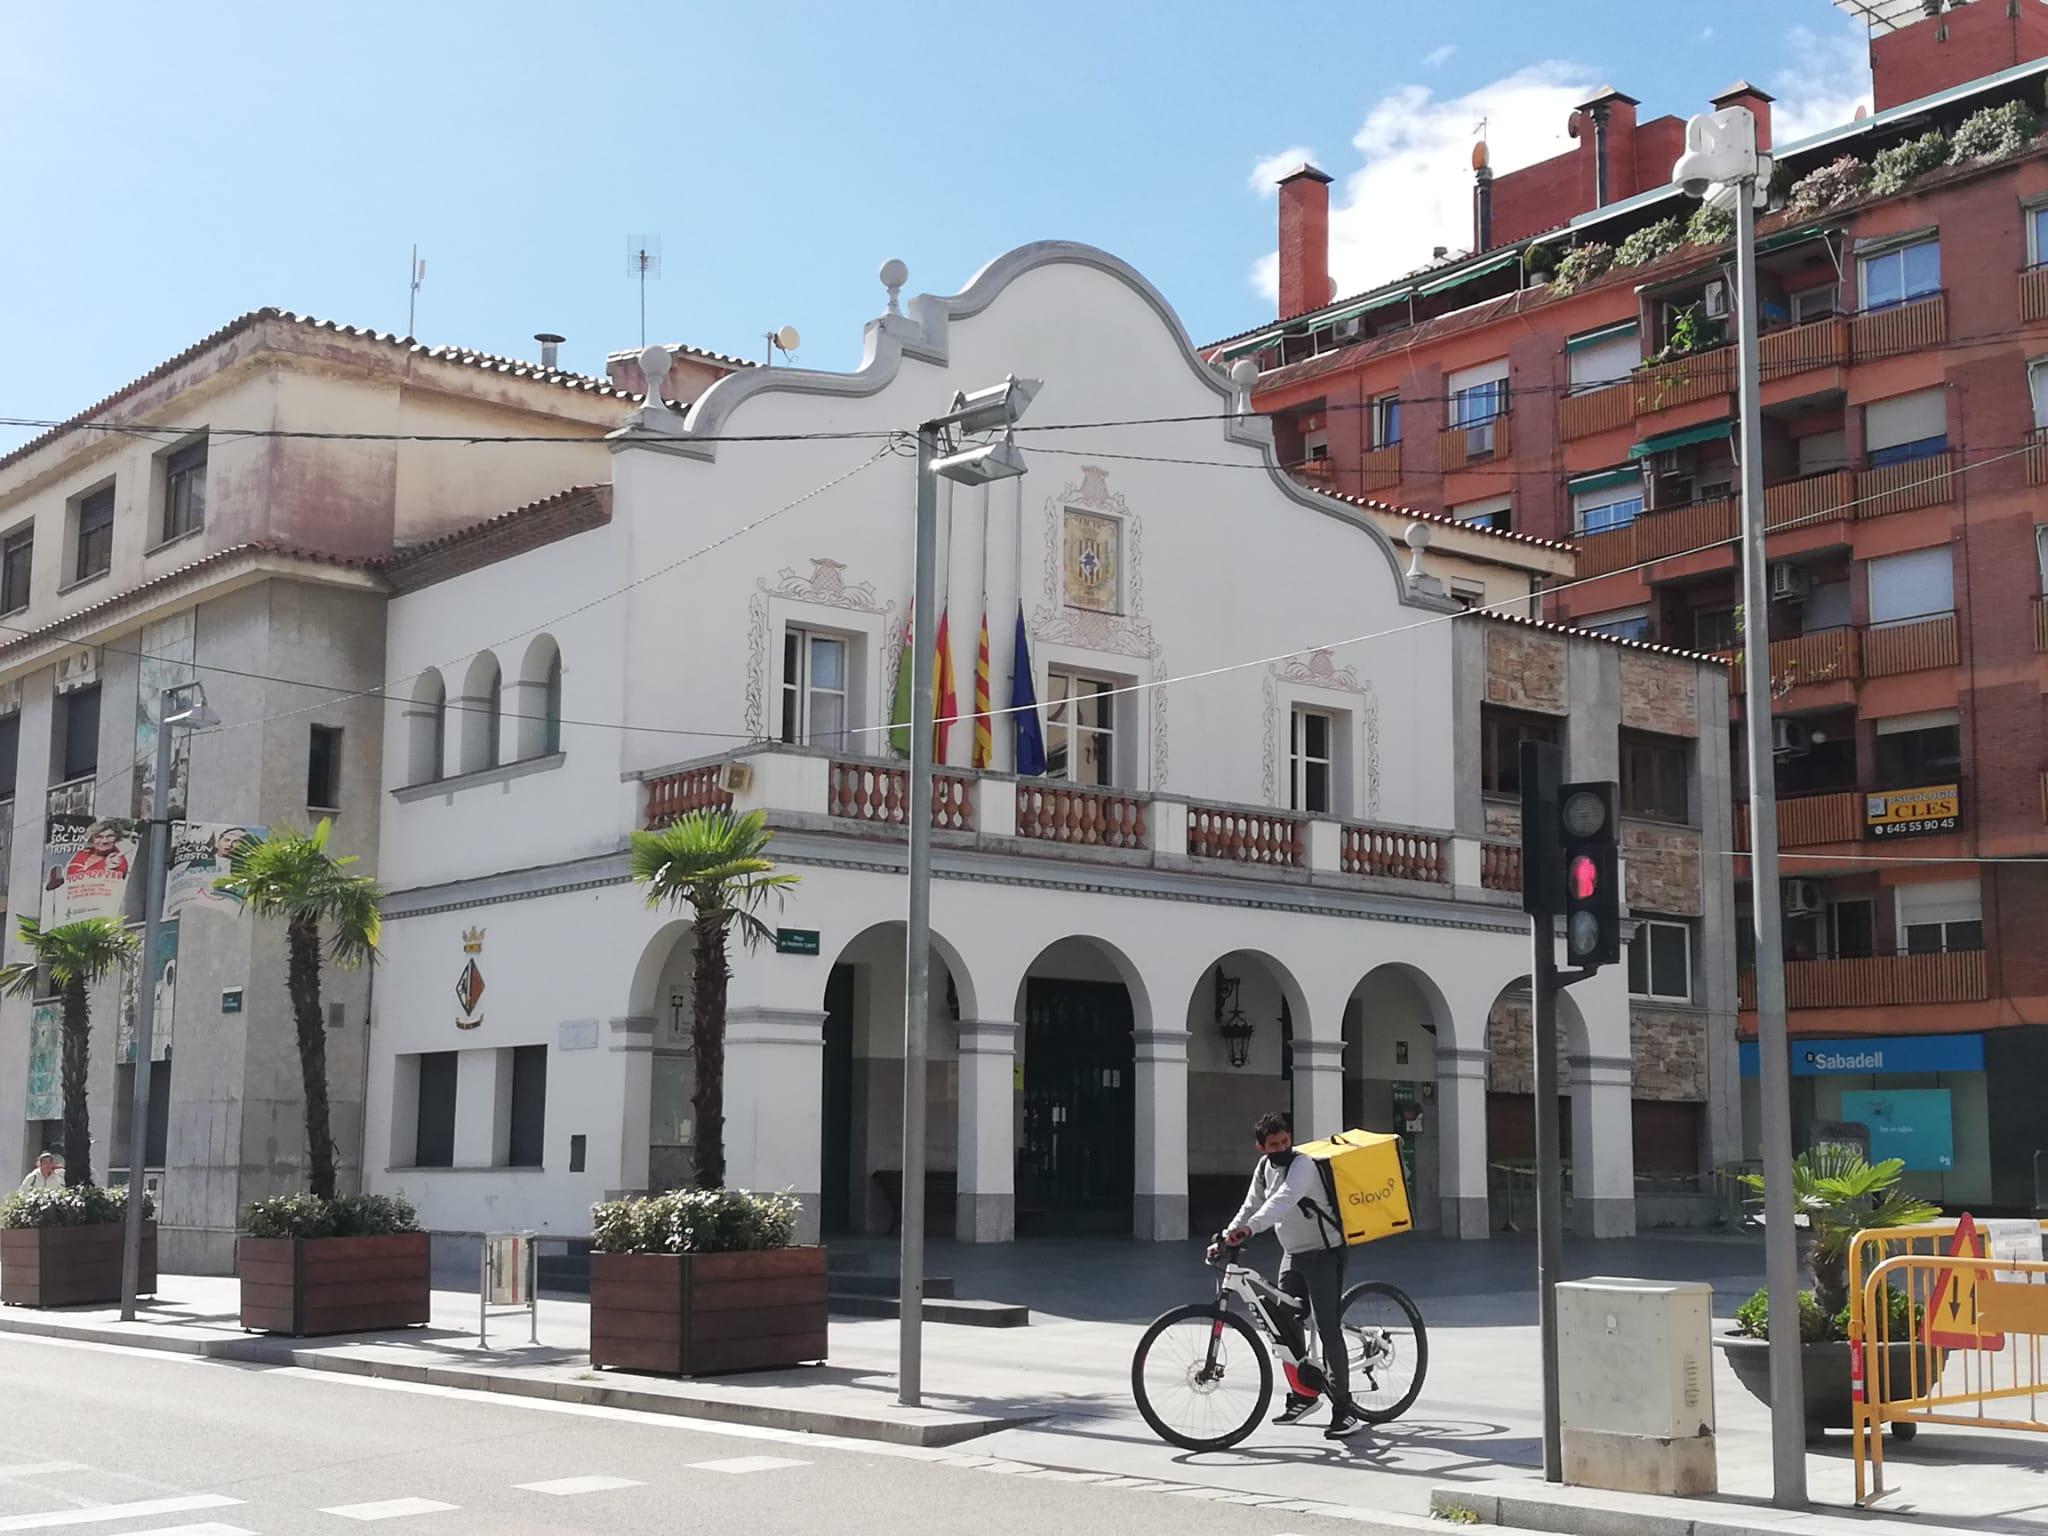 Ajuntament de Cerdanyola | Toni Alfaro